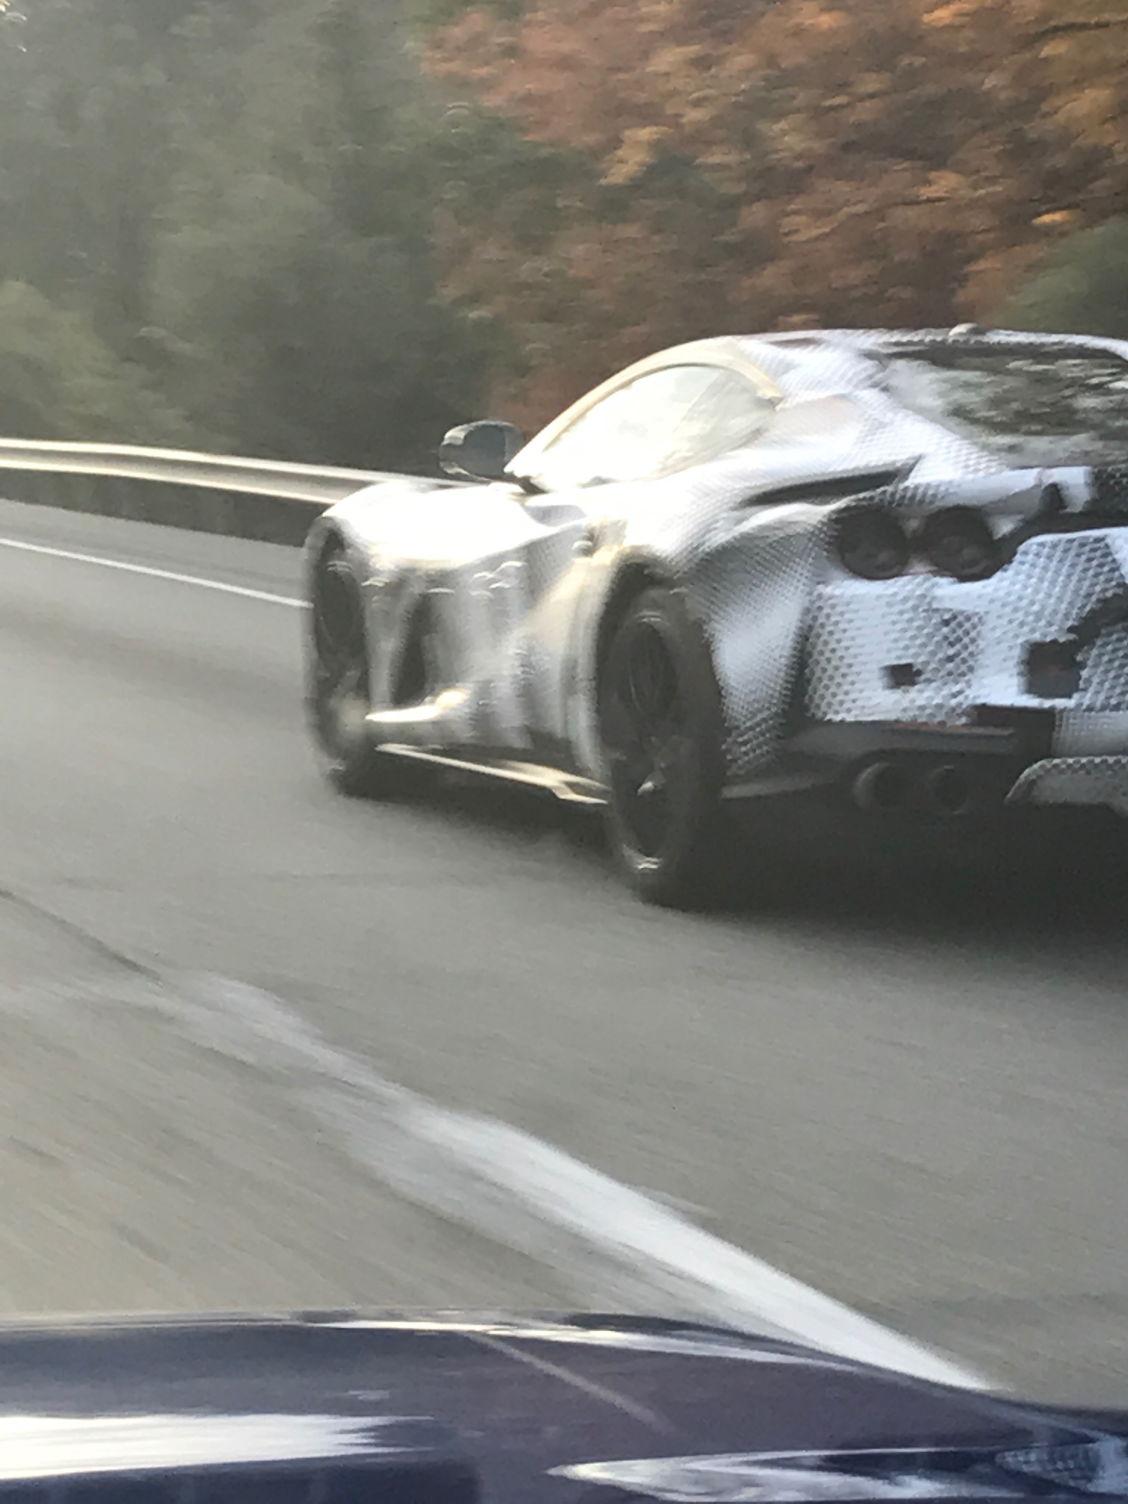 New mid-engine Corvette spy shots? - CorvetteForum - Chevrolet Corvette Forum Discussion